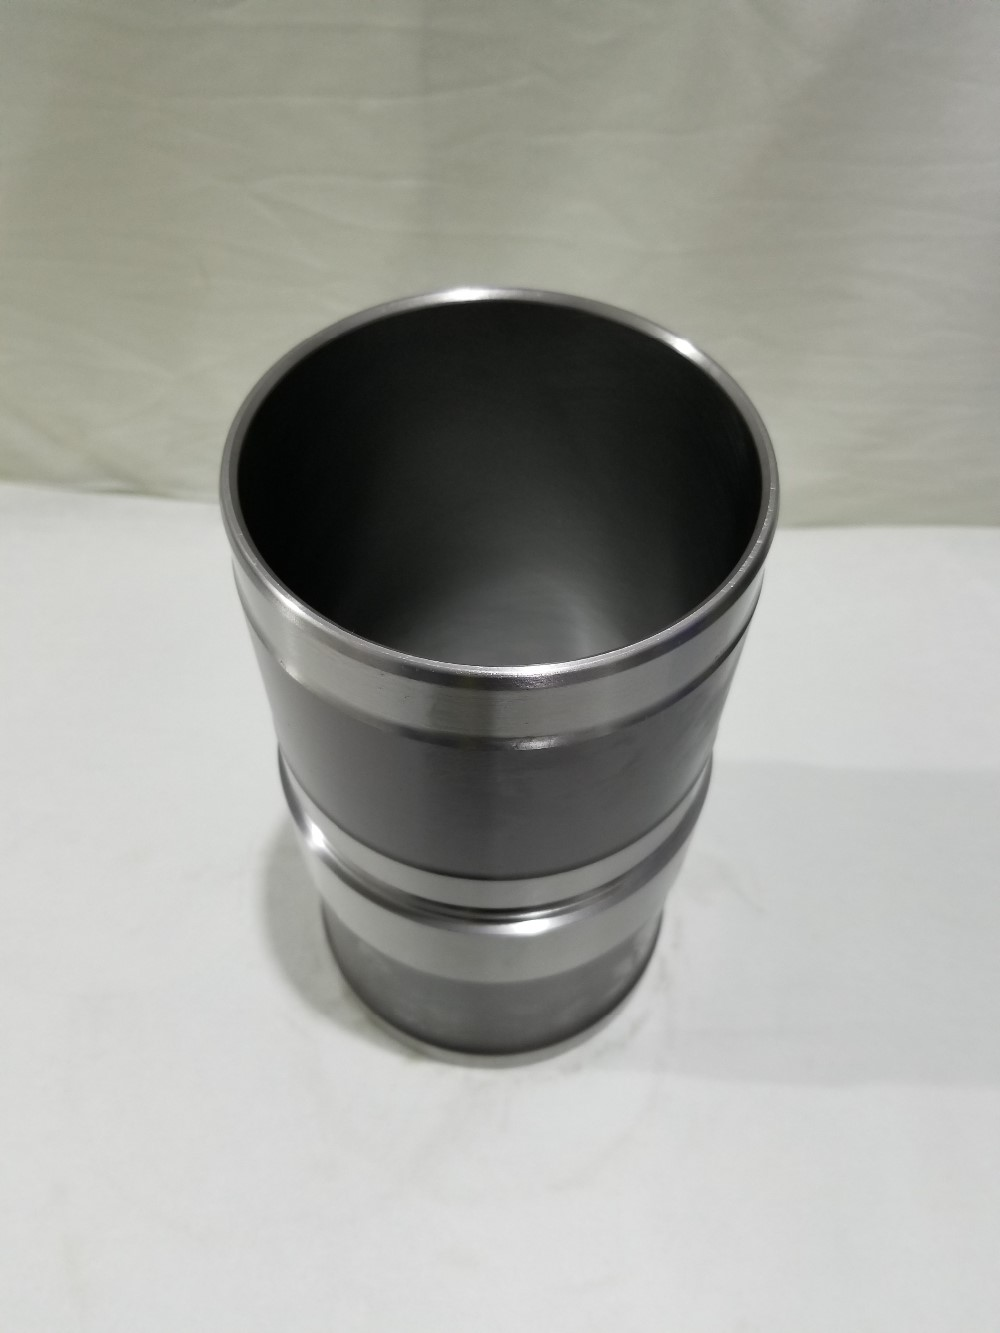 http://jumbosan.com.tr/wp-content/uploads/Engine-Spare-Parts-M11-3080760-Cylinder-Sleeve-r165-jumbosan-machine-company-2.jpg